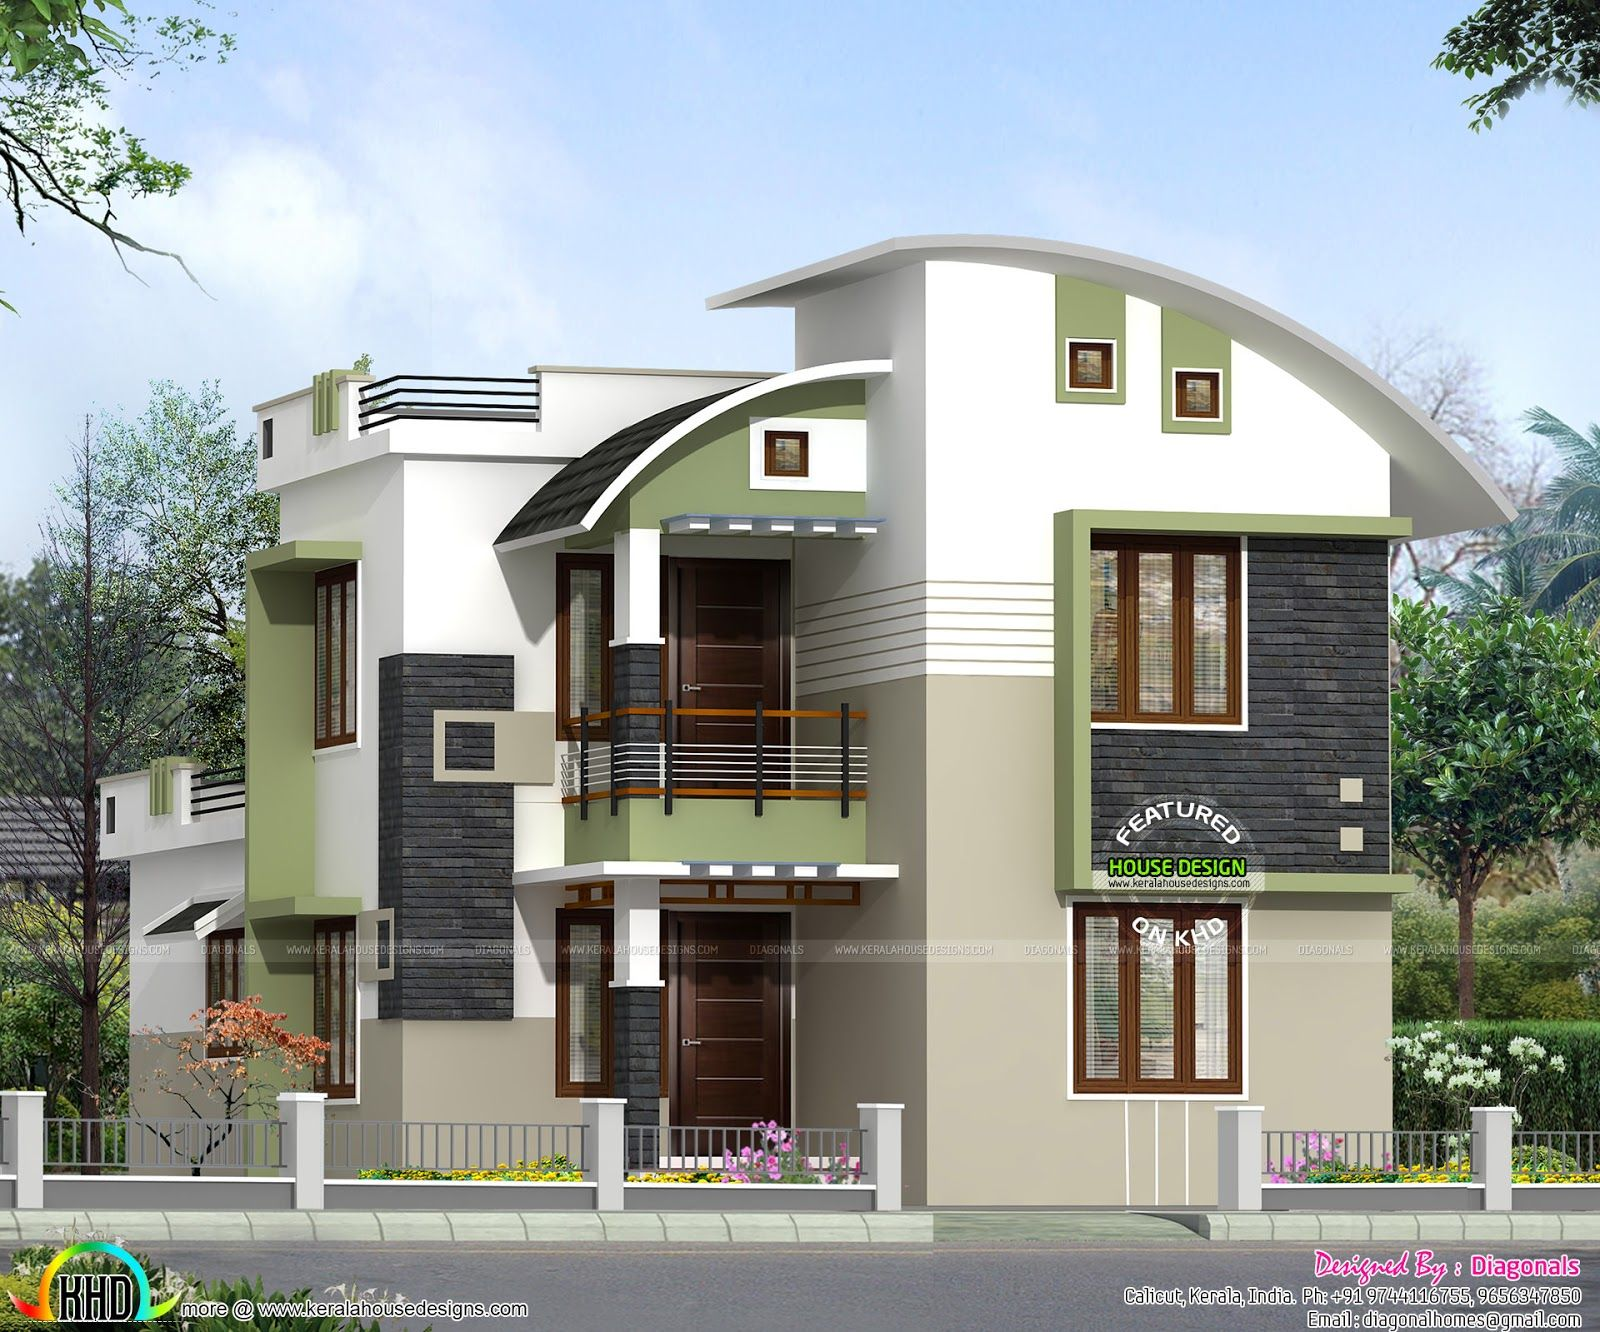 1500 sq ft double floor home jpg 1600 1332 naeem prince